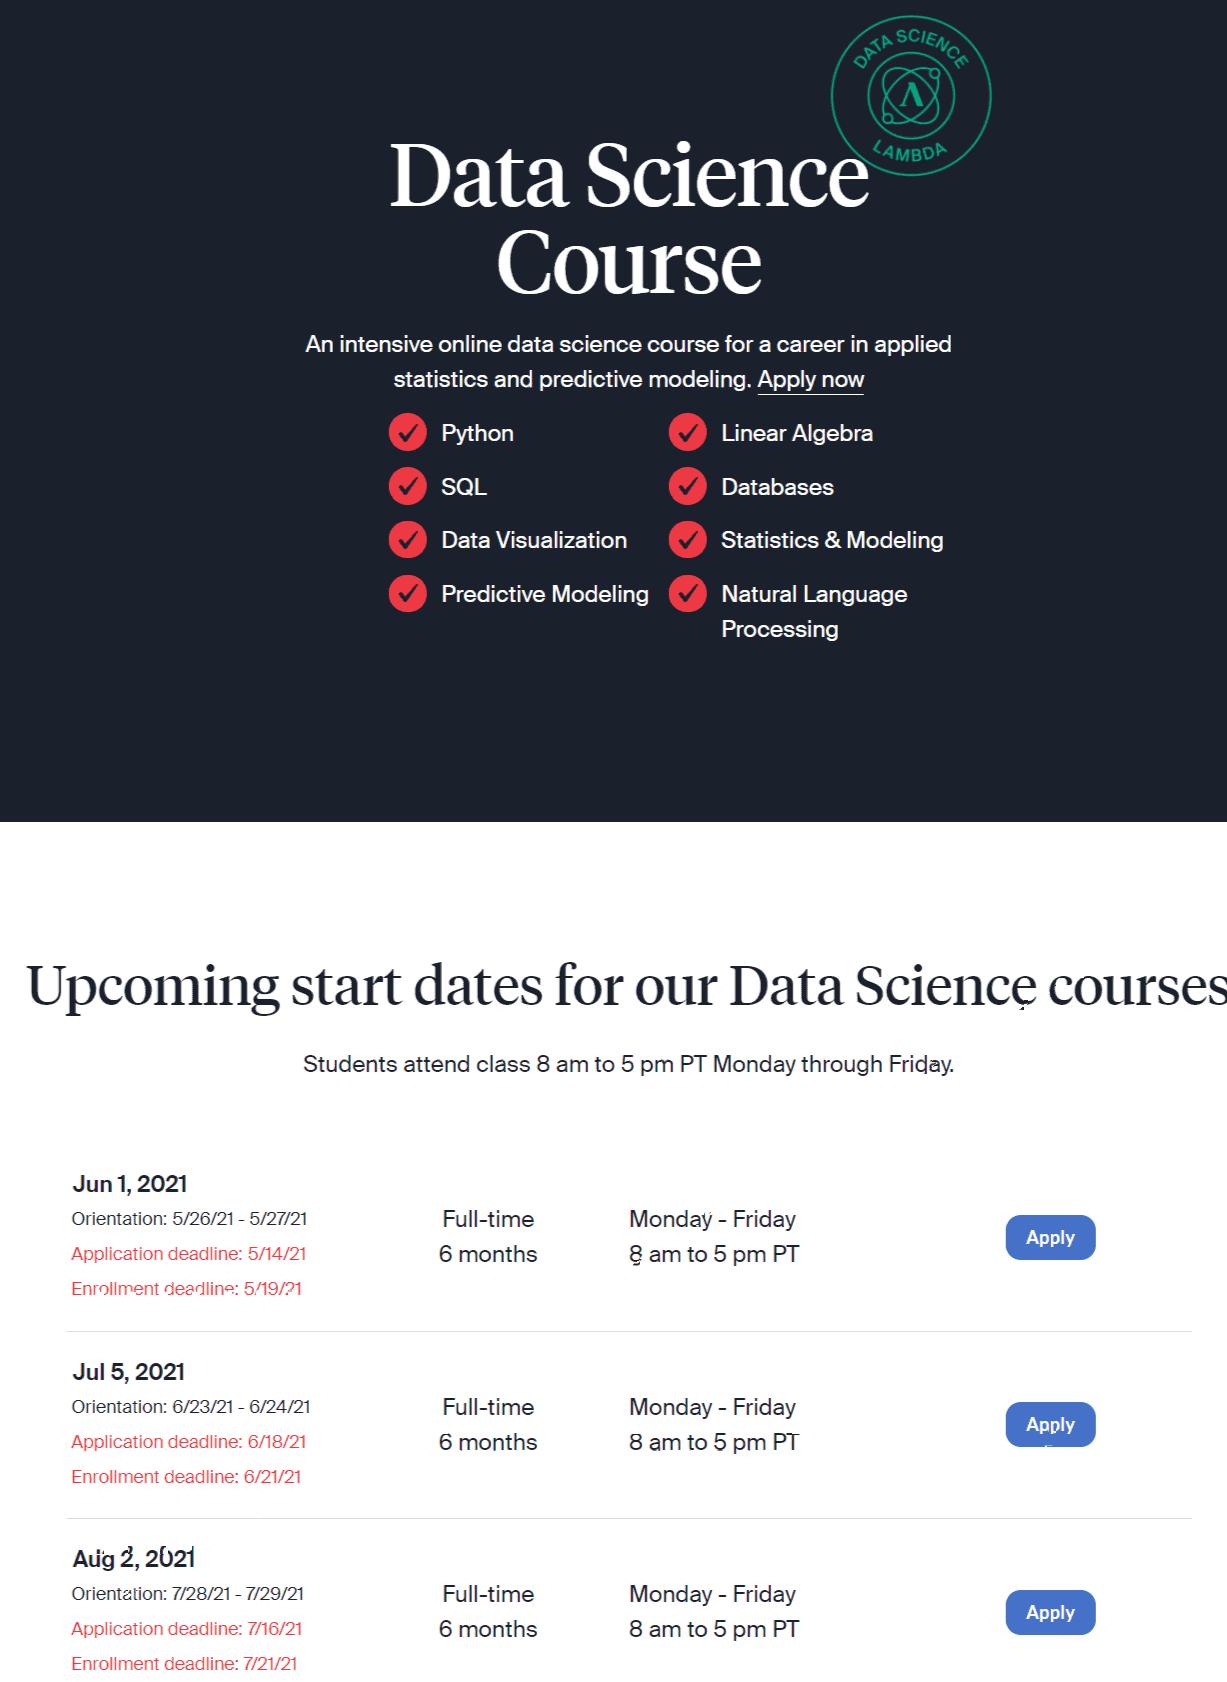 Online Data Sciences-Lambda school review